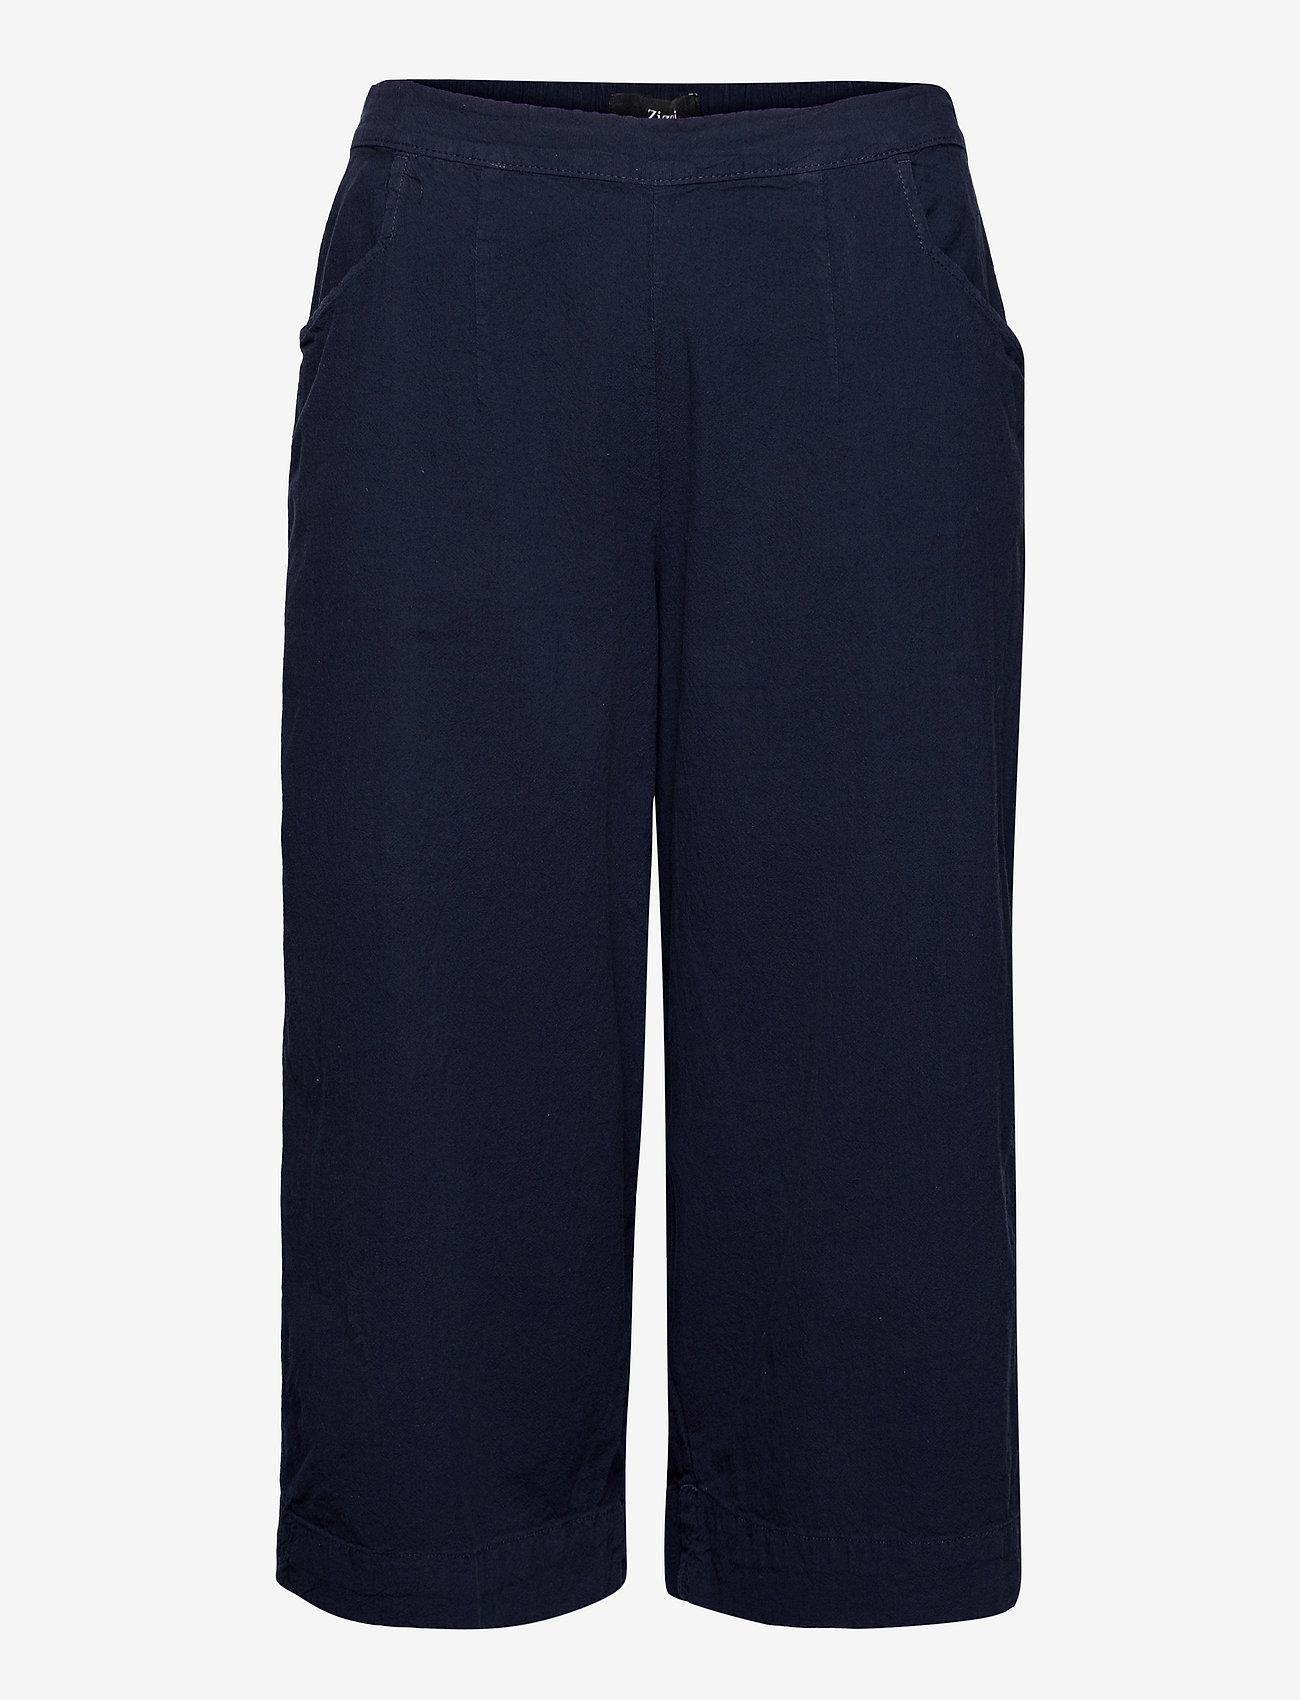 Zizzi - Trousers Culotte Plus Size Loose Fit Elastic Waistband - bukser med brede ben - dark blue - 0